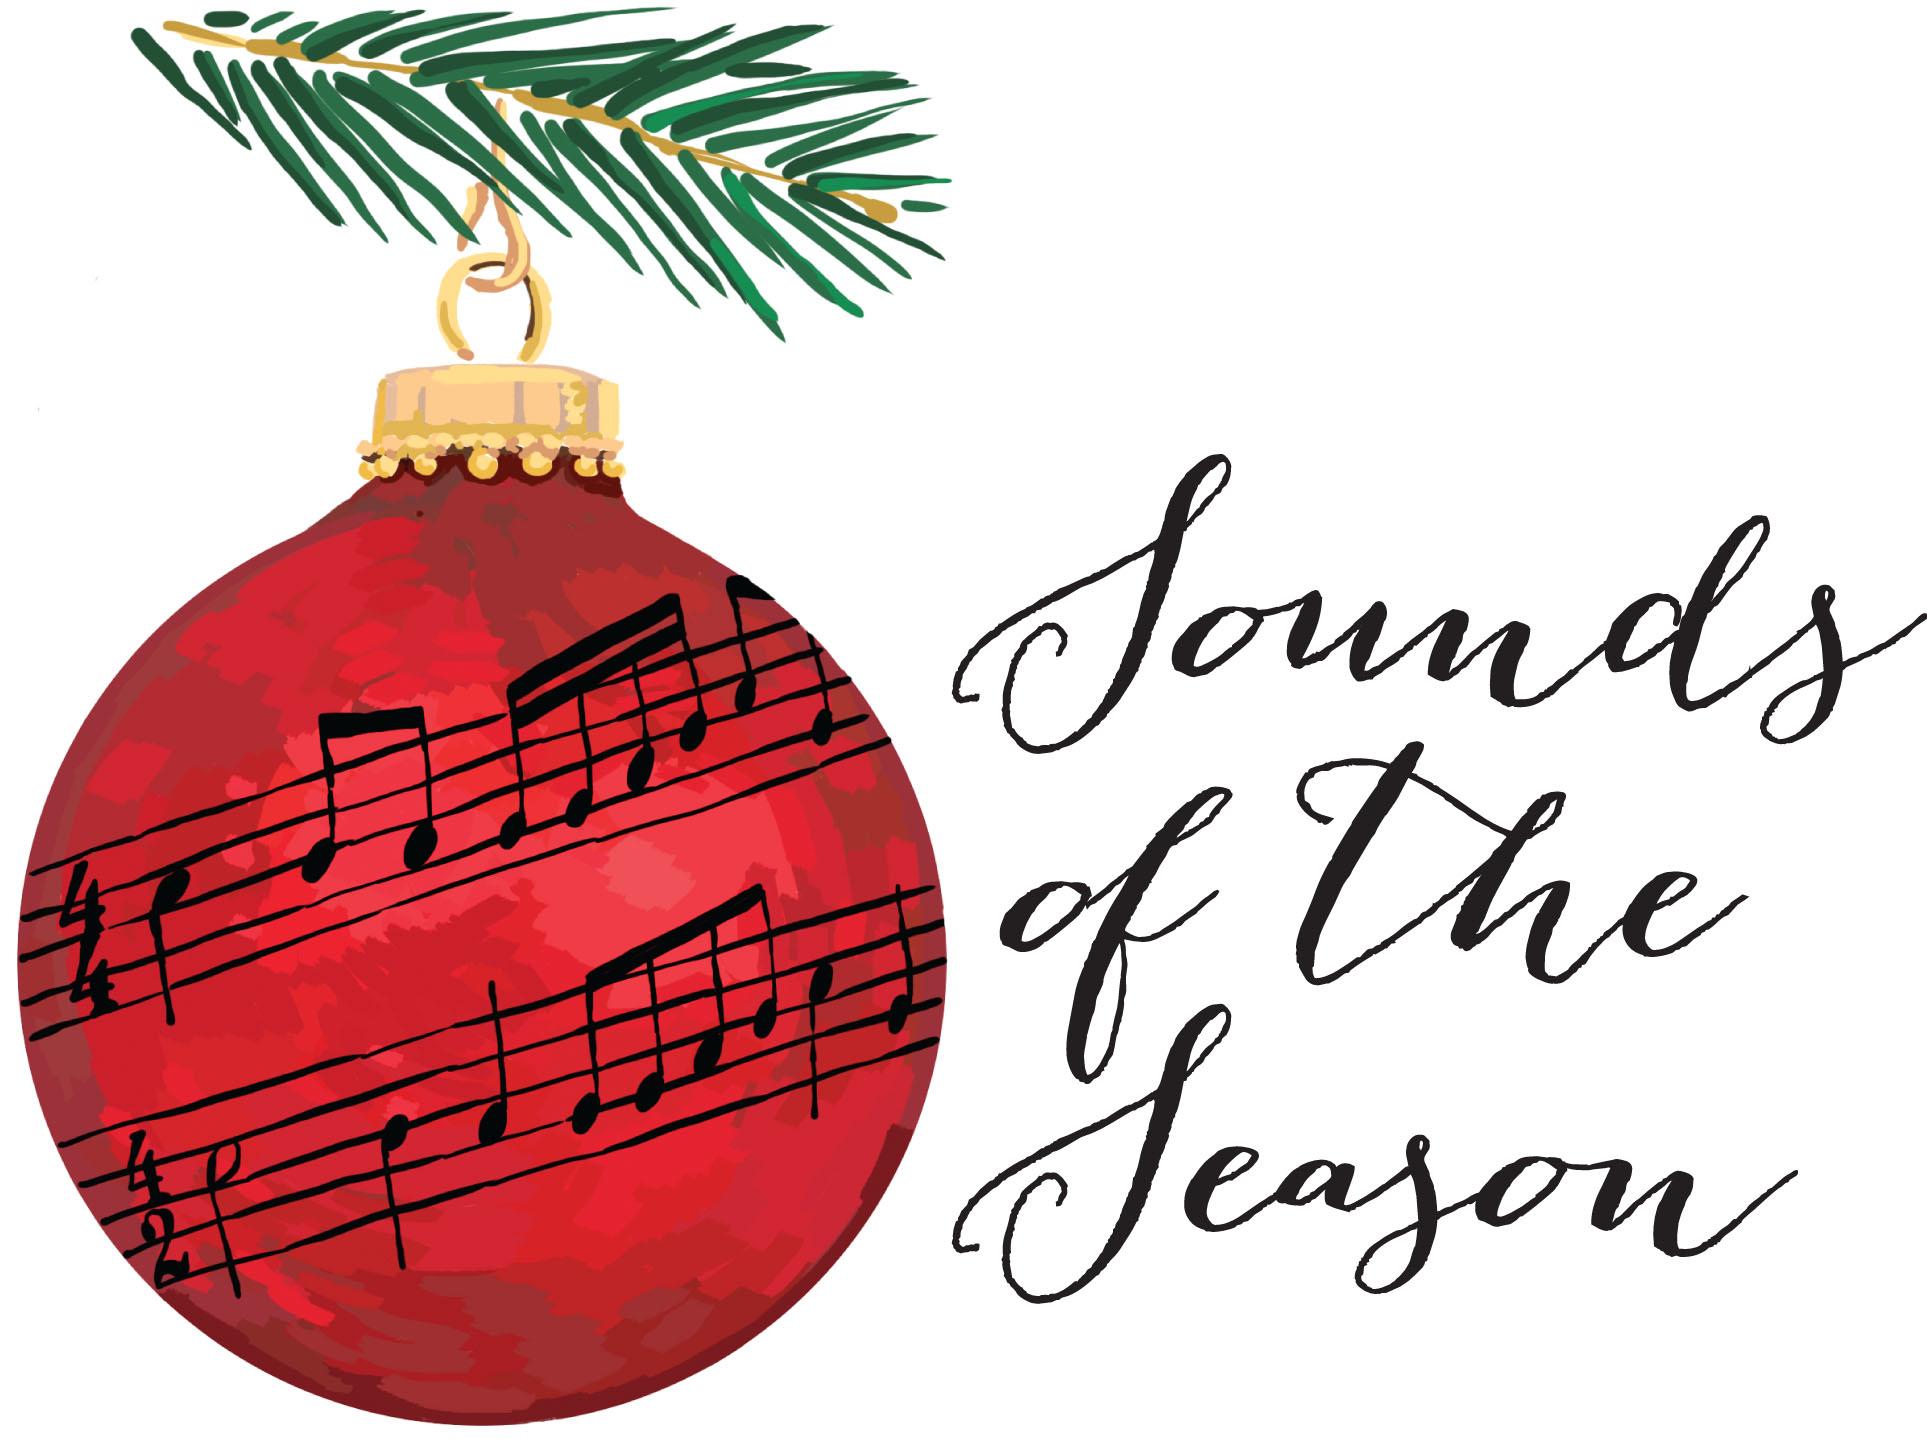 2017 Christmas Recital -            Normal  0          false  false  false    EN-US  JA  X-NONE                                                                                                                                                                                                                                                                                                                                             /* Style Definitions */ table.MsoNormalTable {mso-style-name: